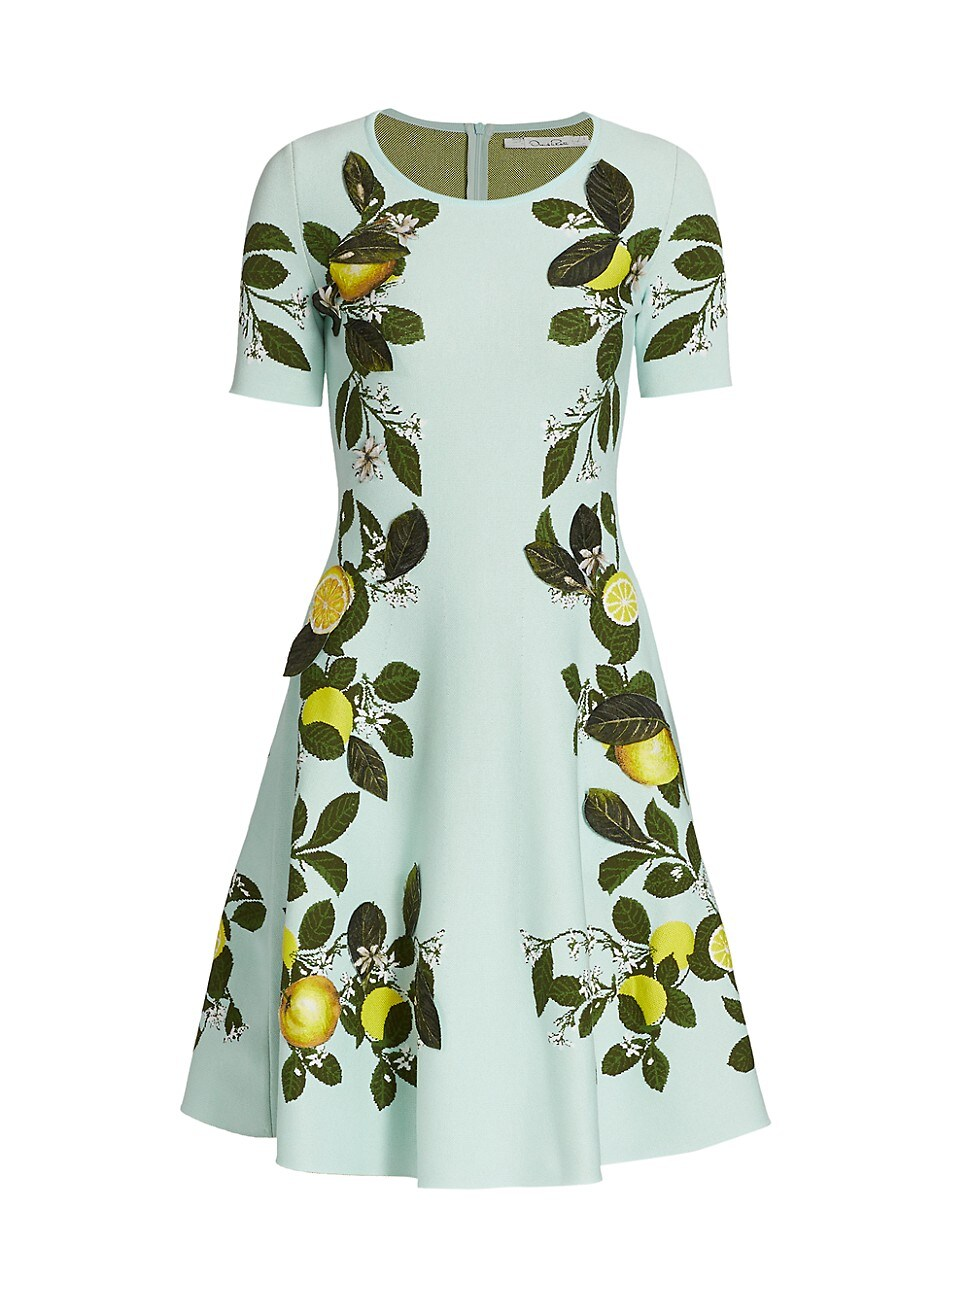 OSCAR DE LA RENTA WOMEN'S LEMON JACQUARD FIT-&-FLARE DRESS